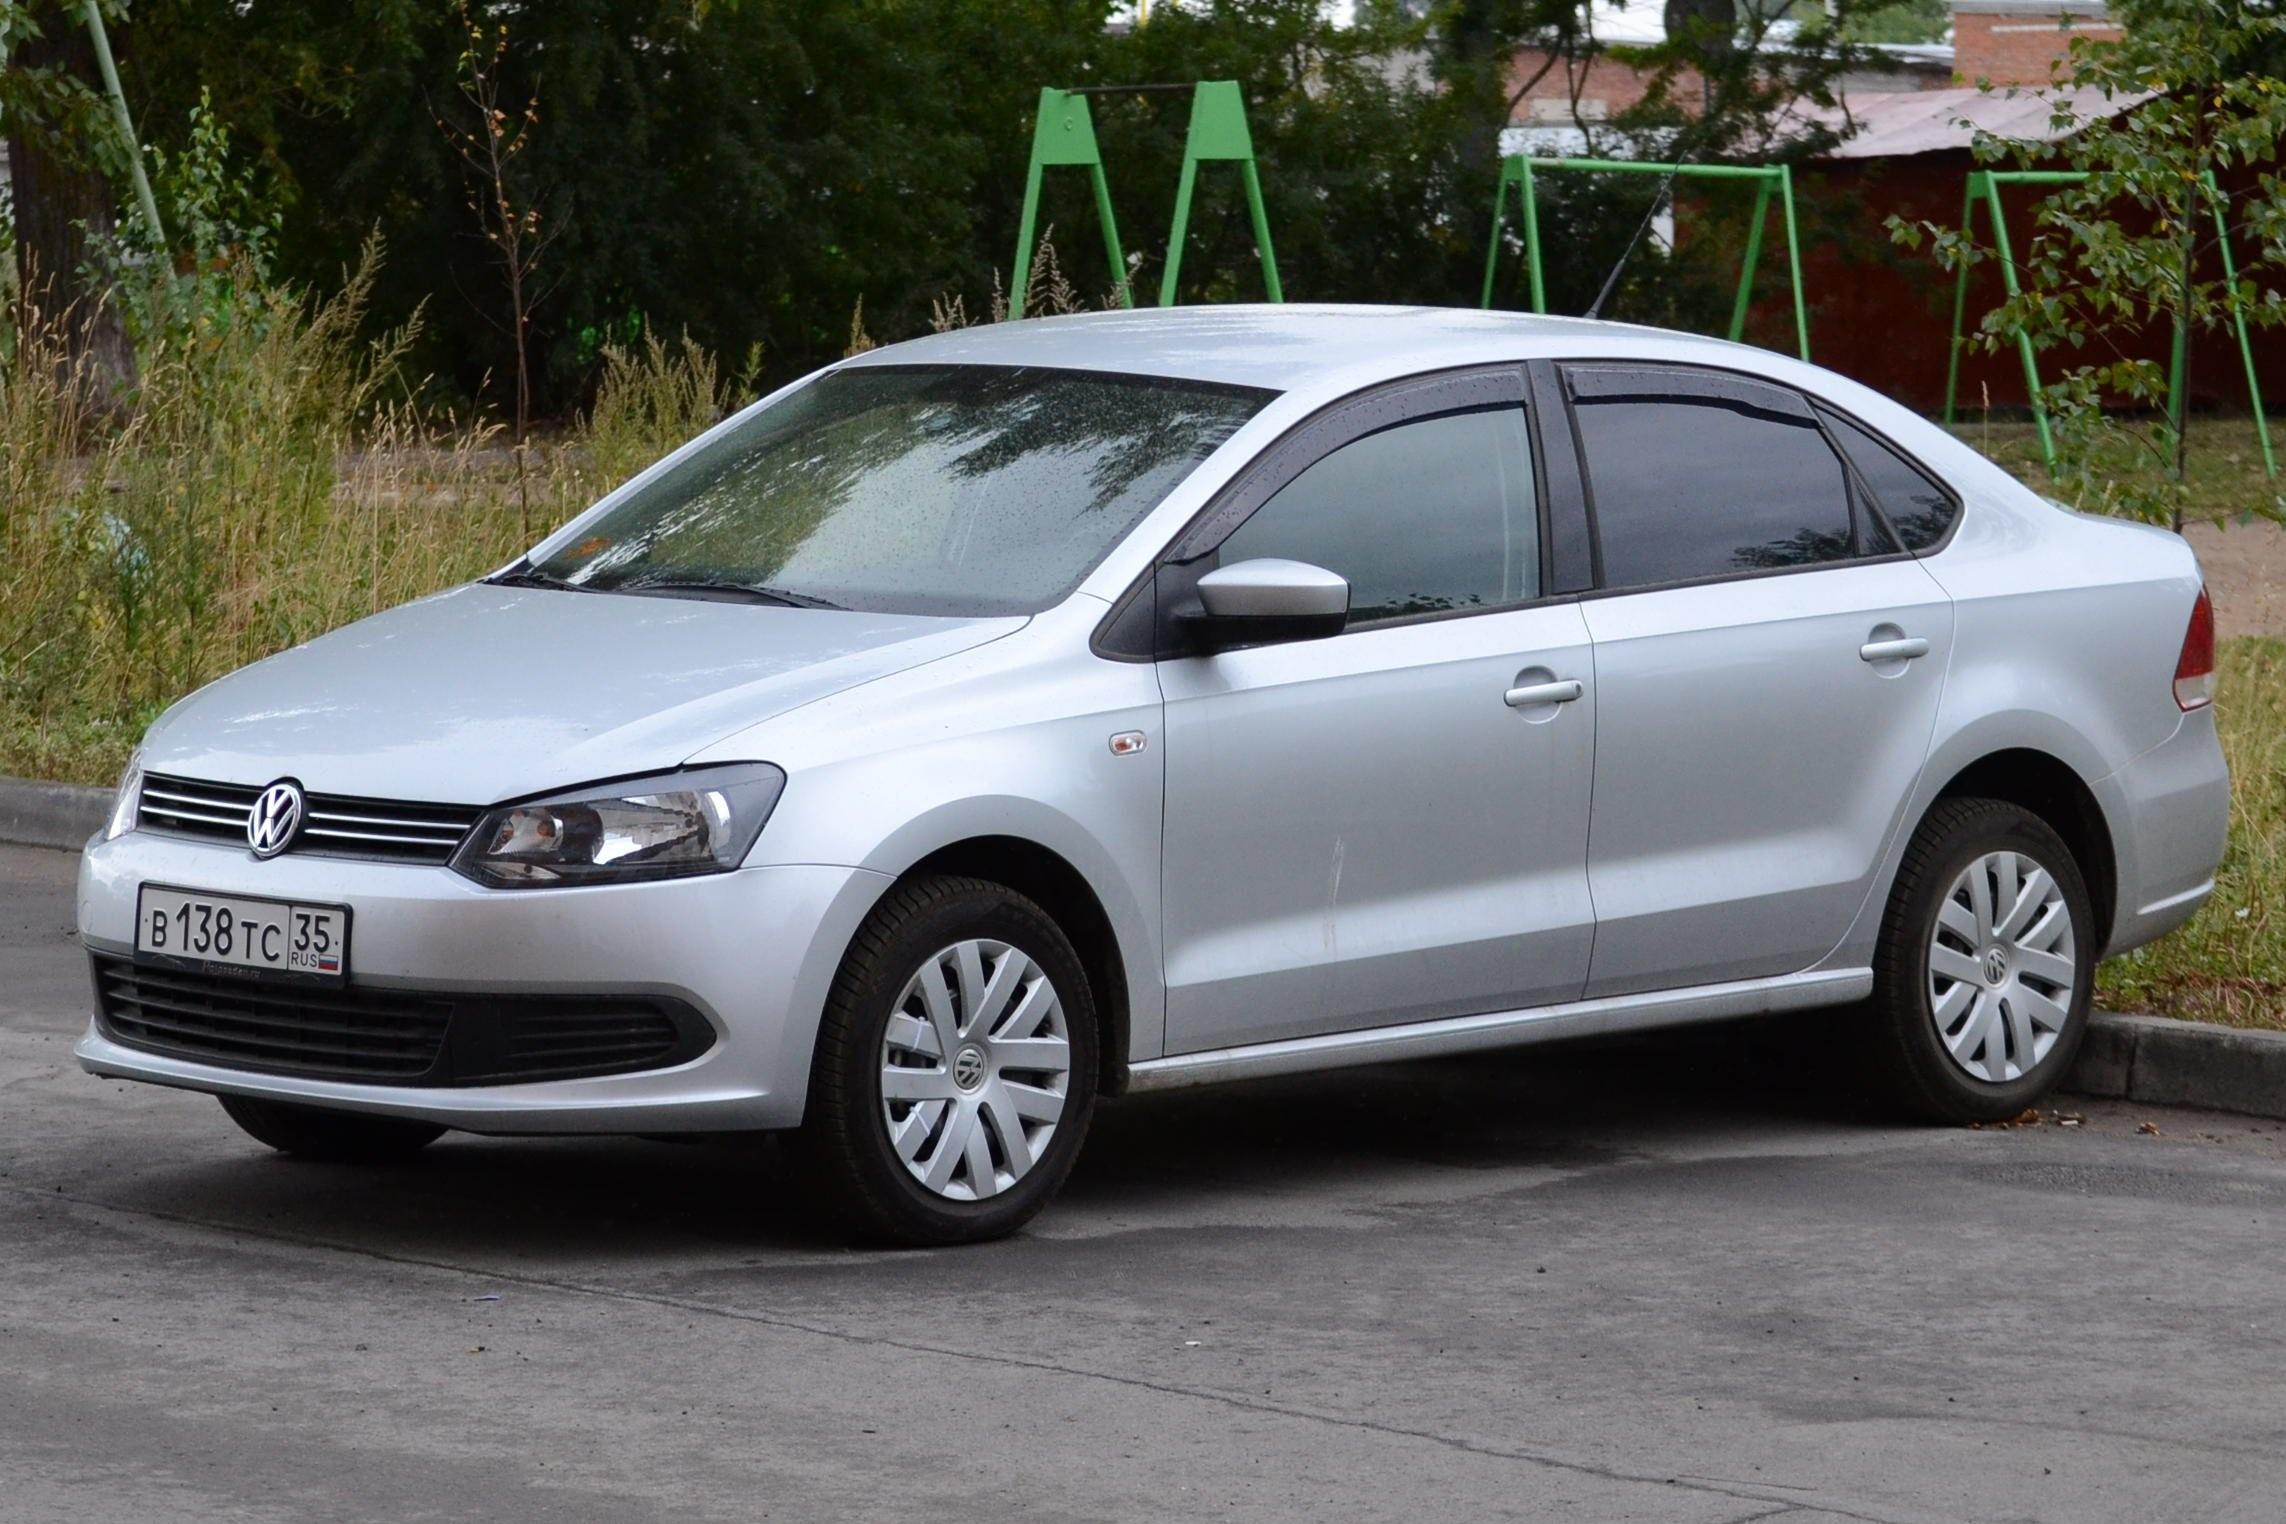 Volkswagen Polo Pics